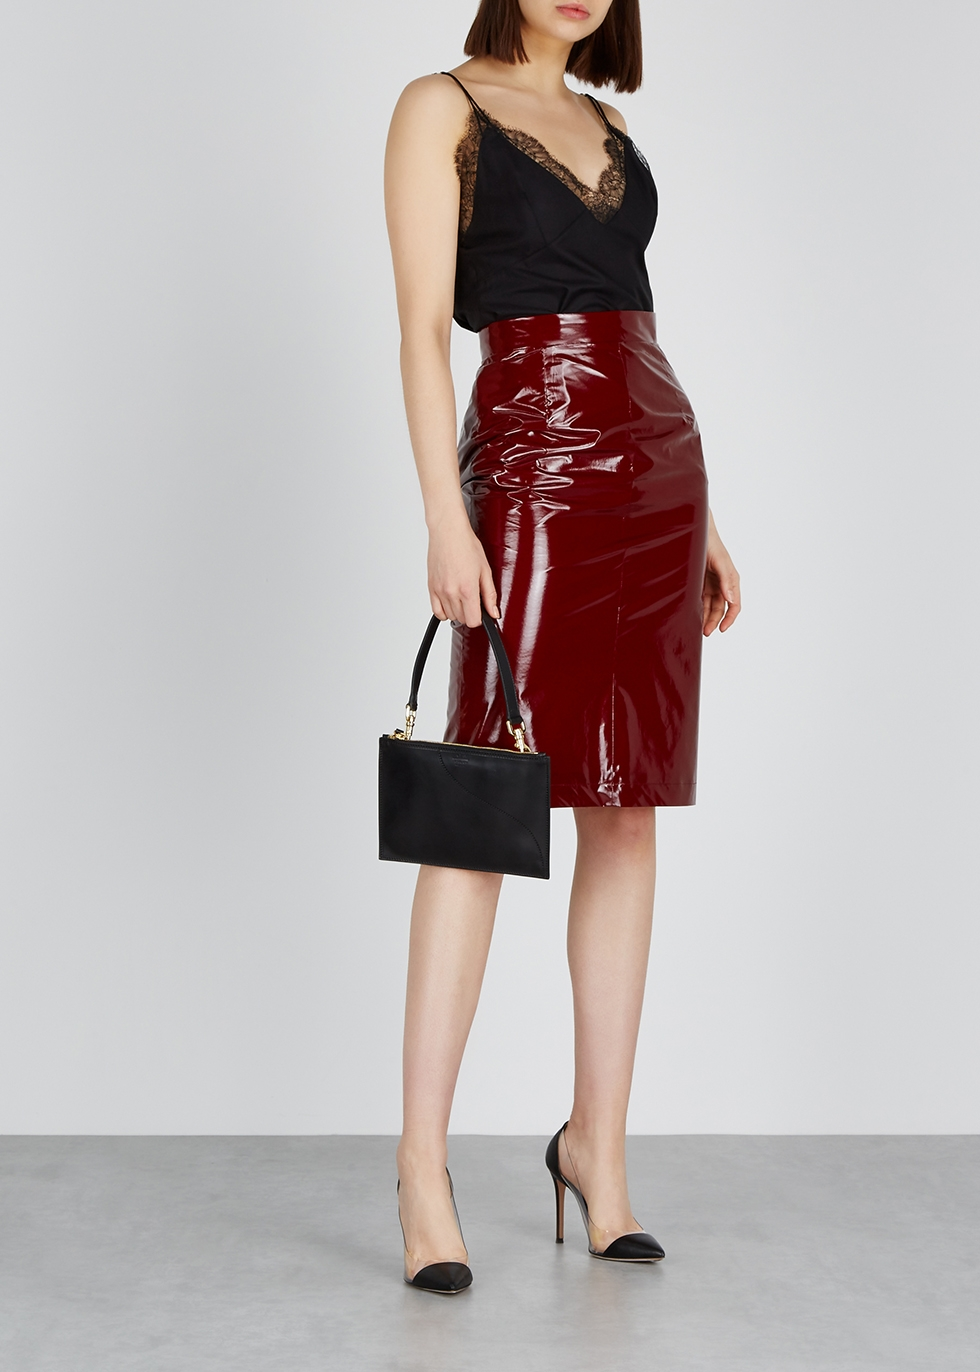 Burgundy silk and PVC pencil skirt - No.21